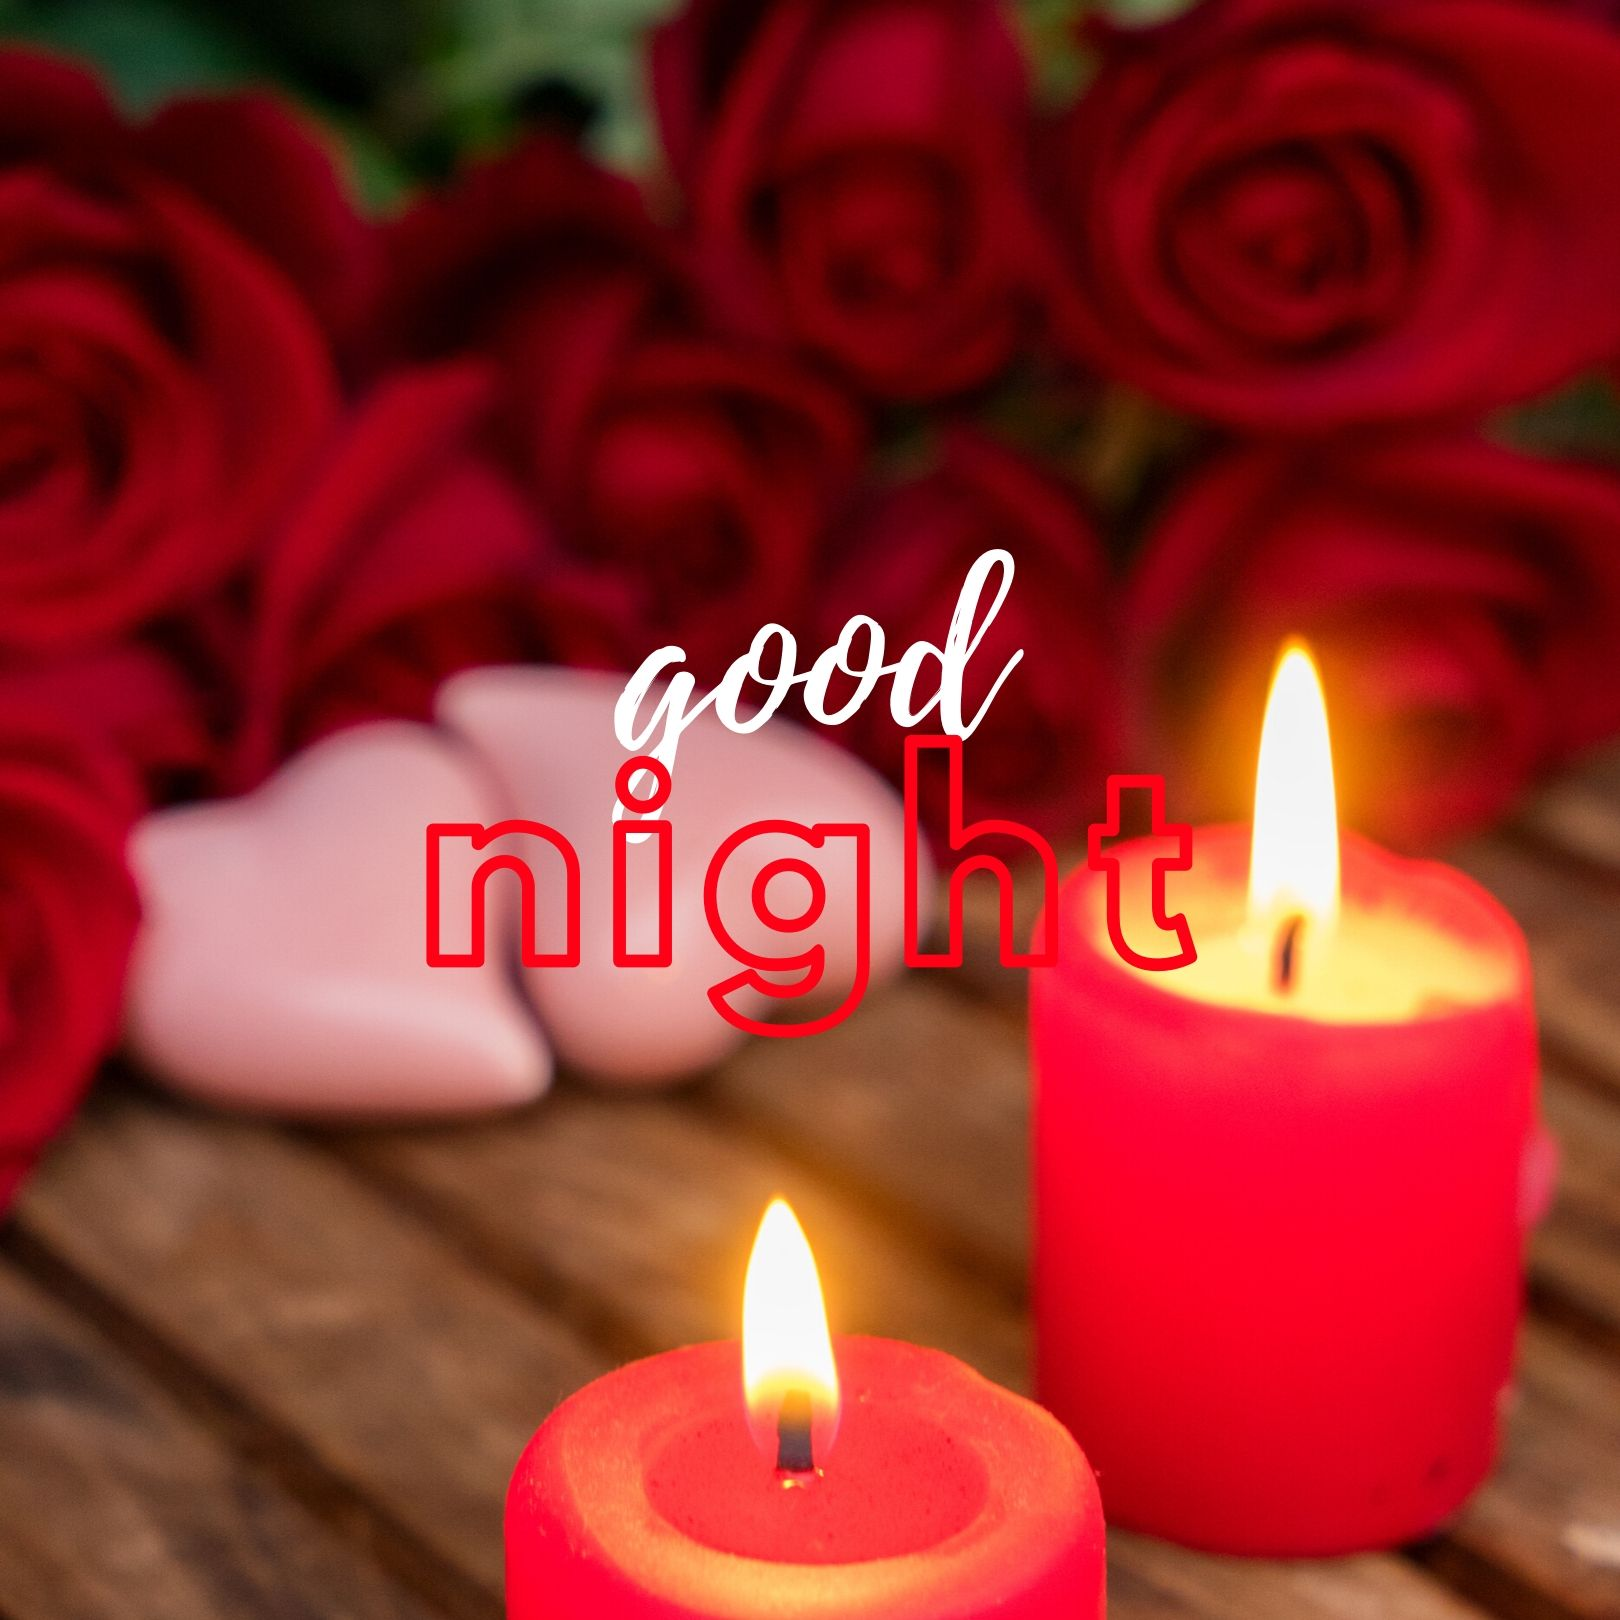 Good Night rose photo full HD free download.